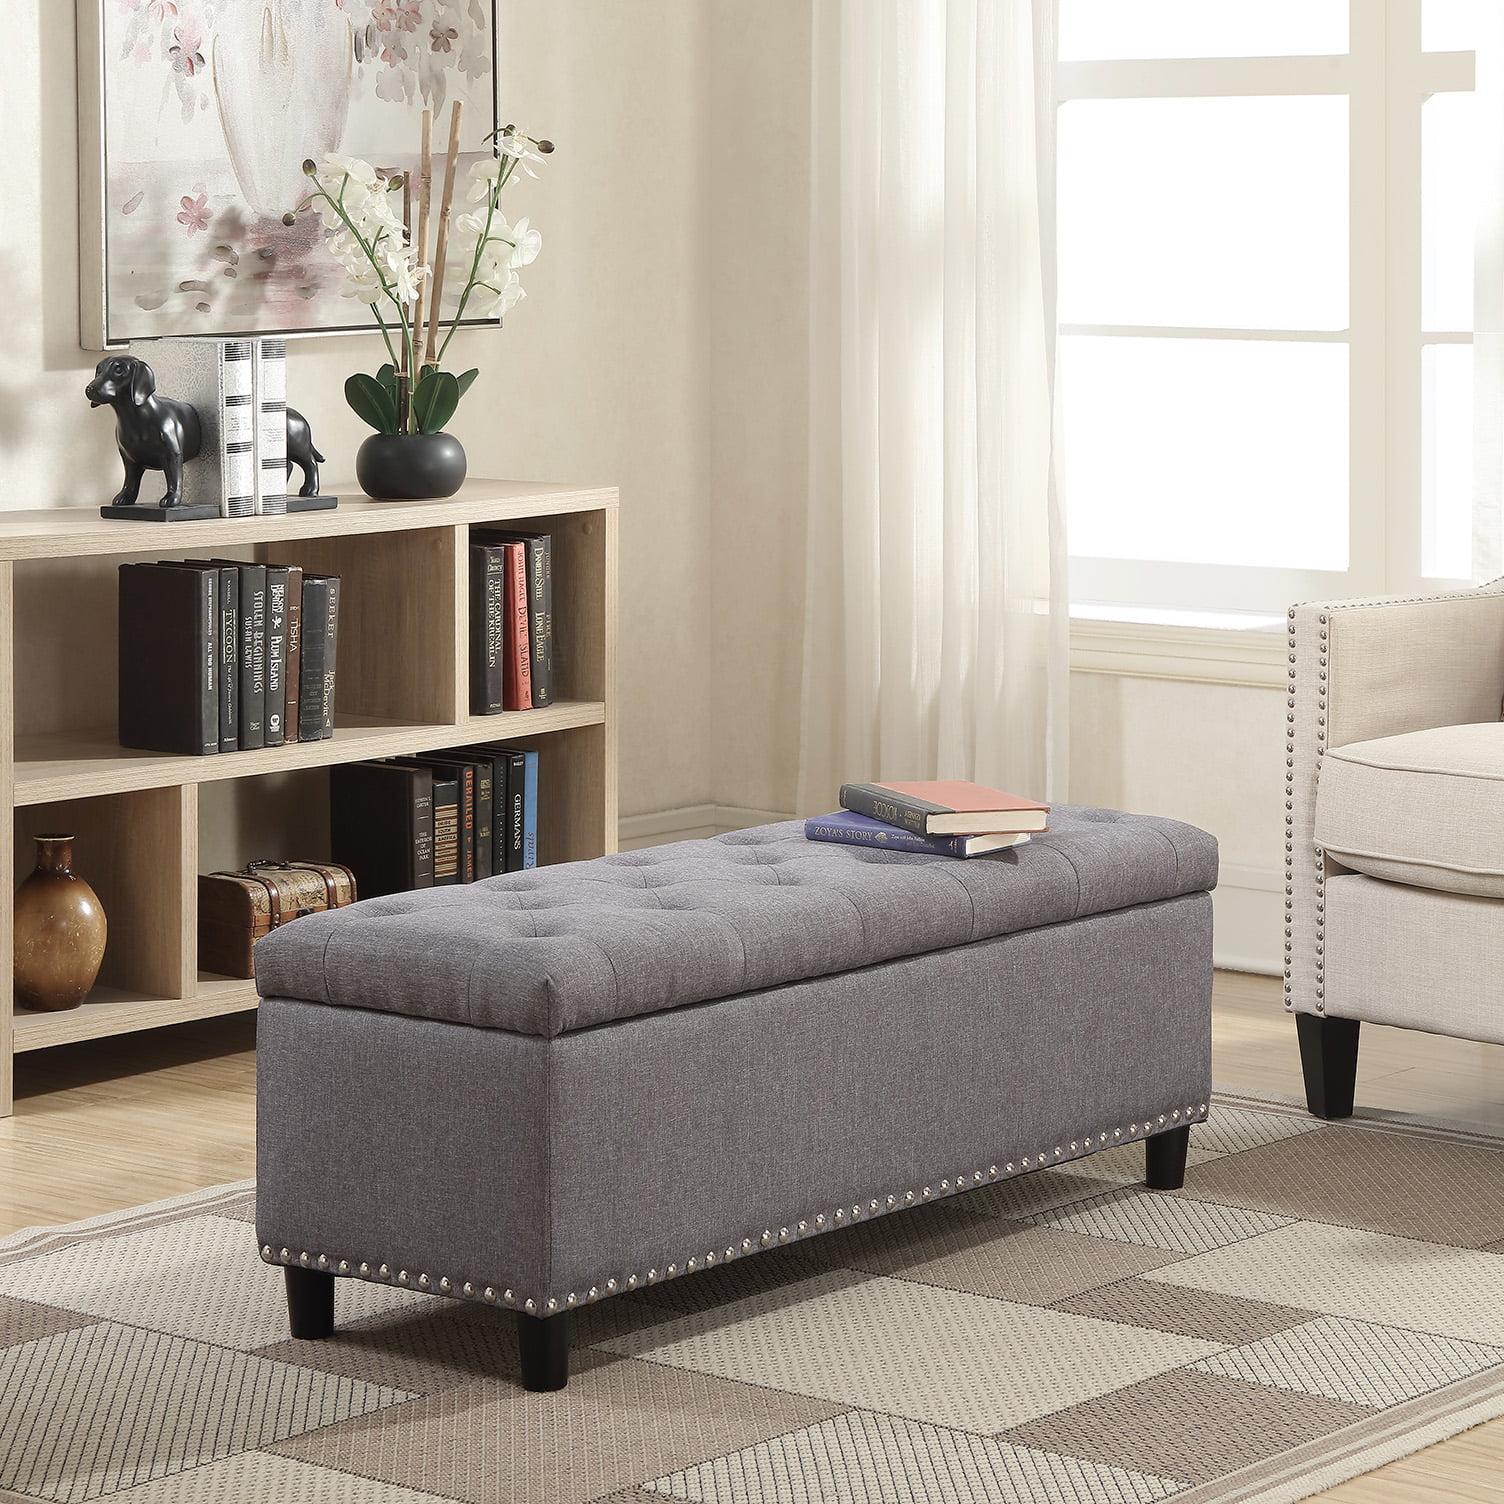 "Belleze 48"" Rectangular Gray Storage Fabric Ottoman Bench Tufted Footrest Lift Top by Belleze"